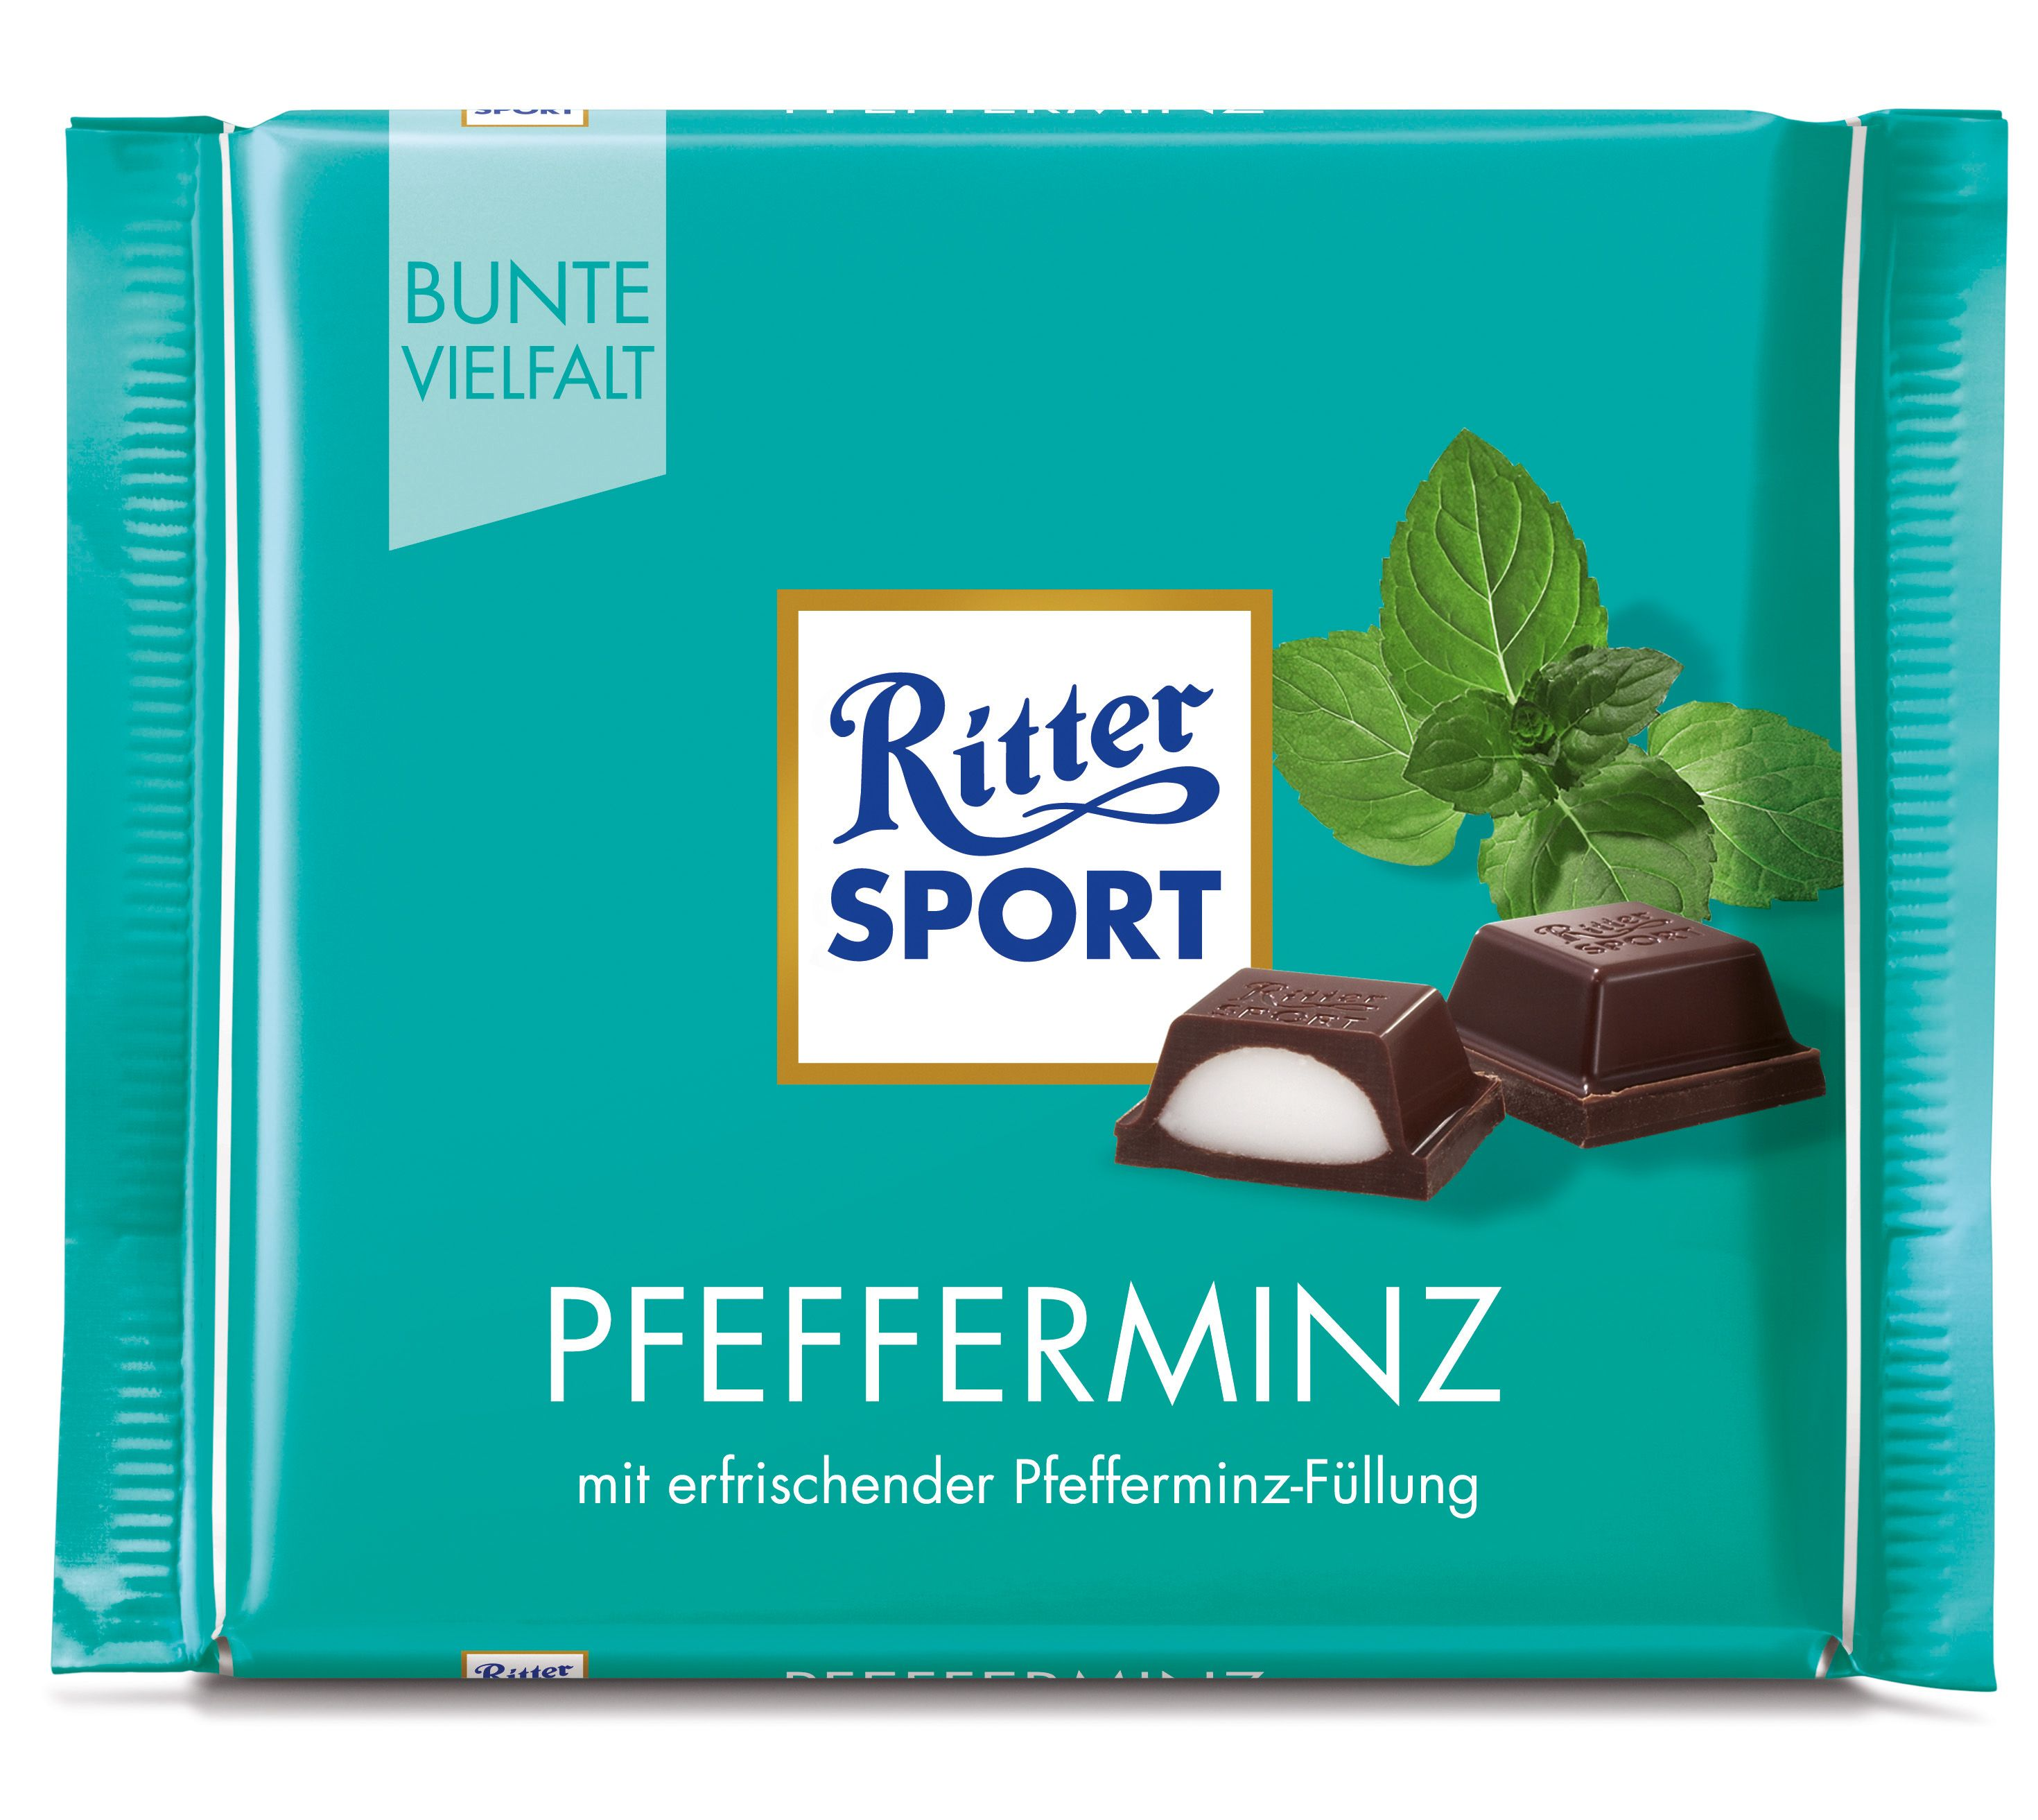 RITTER SPORT Pfefferminz Ritter sport, Pfefferminze, Sport